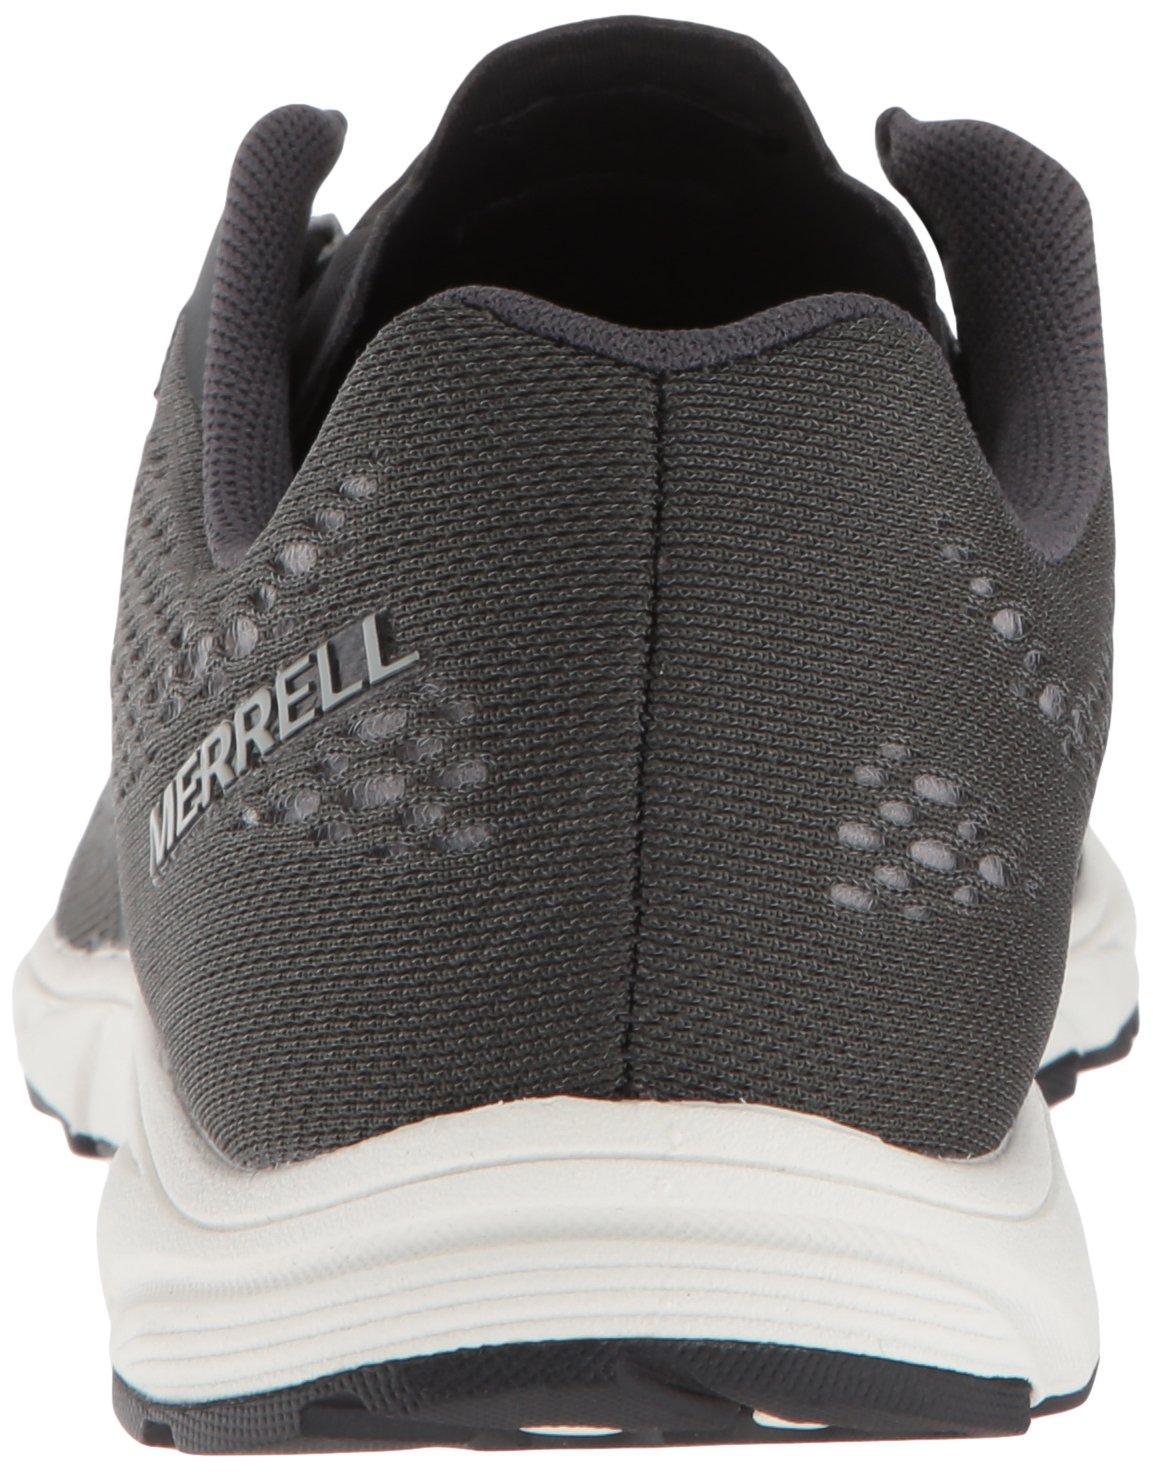 Merrell Women's Riveter E-Mesh Sneaker B072QDMJNT 7.5 B(M) US|Castle Rock